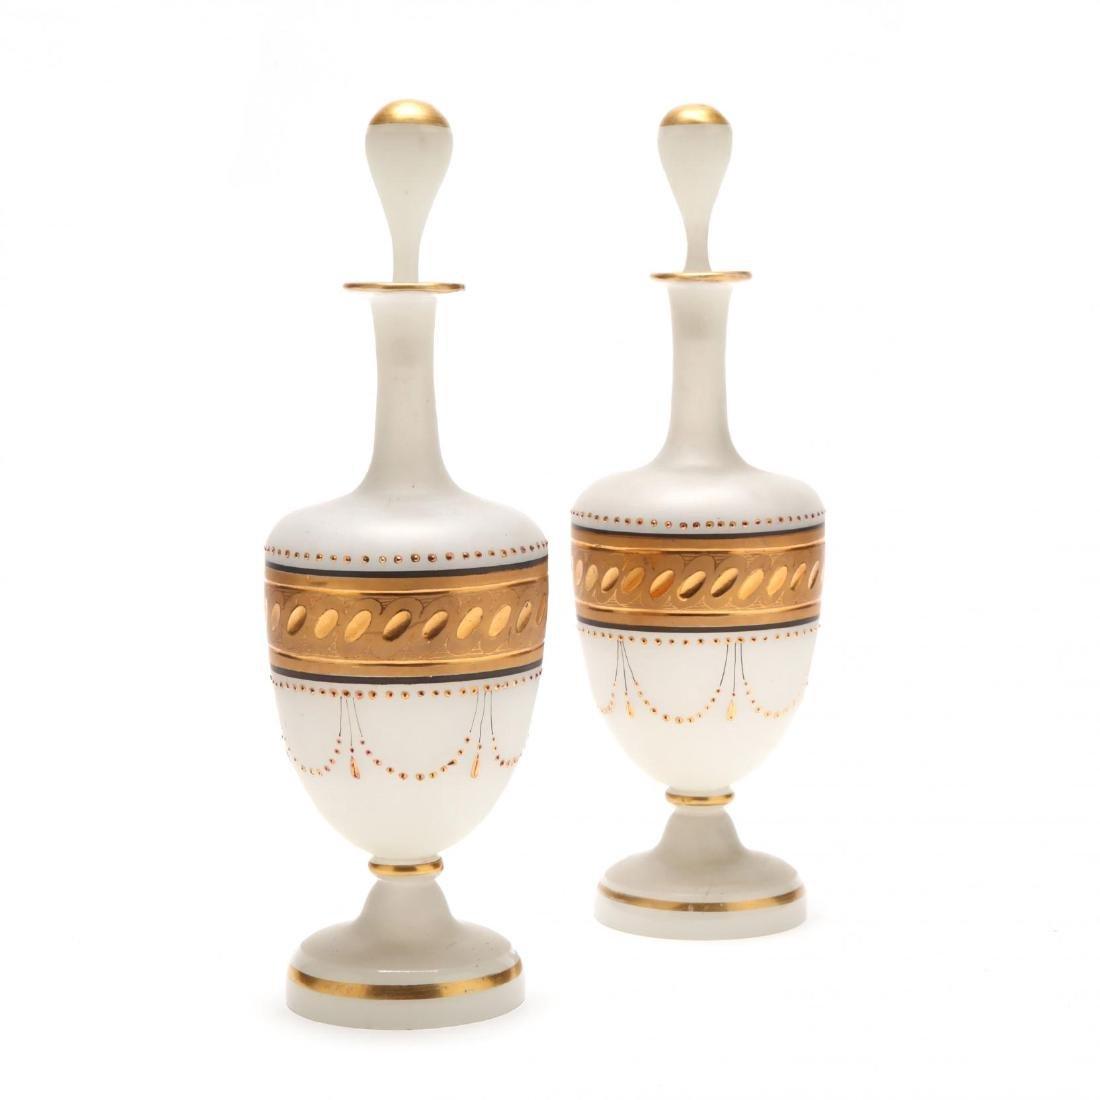 Pair of Bristol Glass Scent Bottles